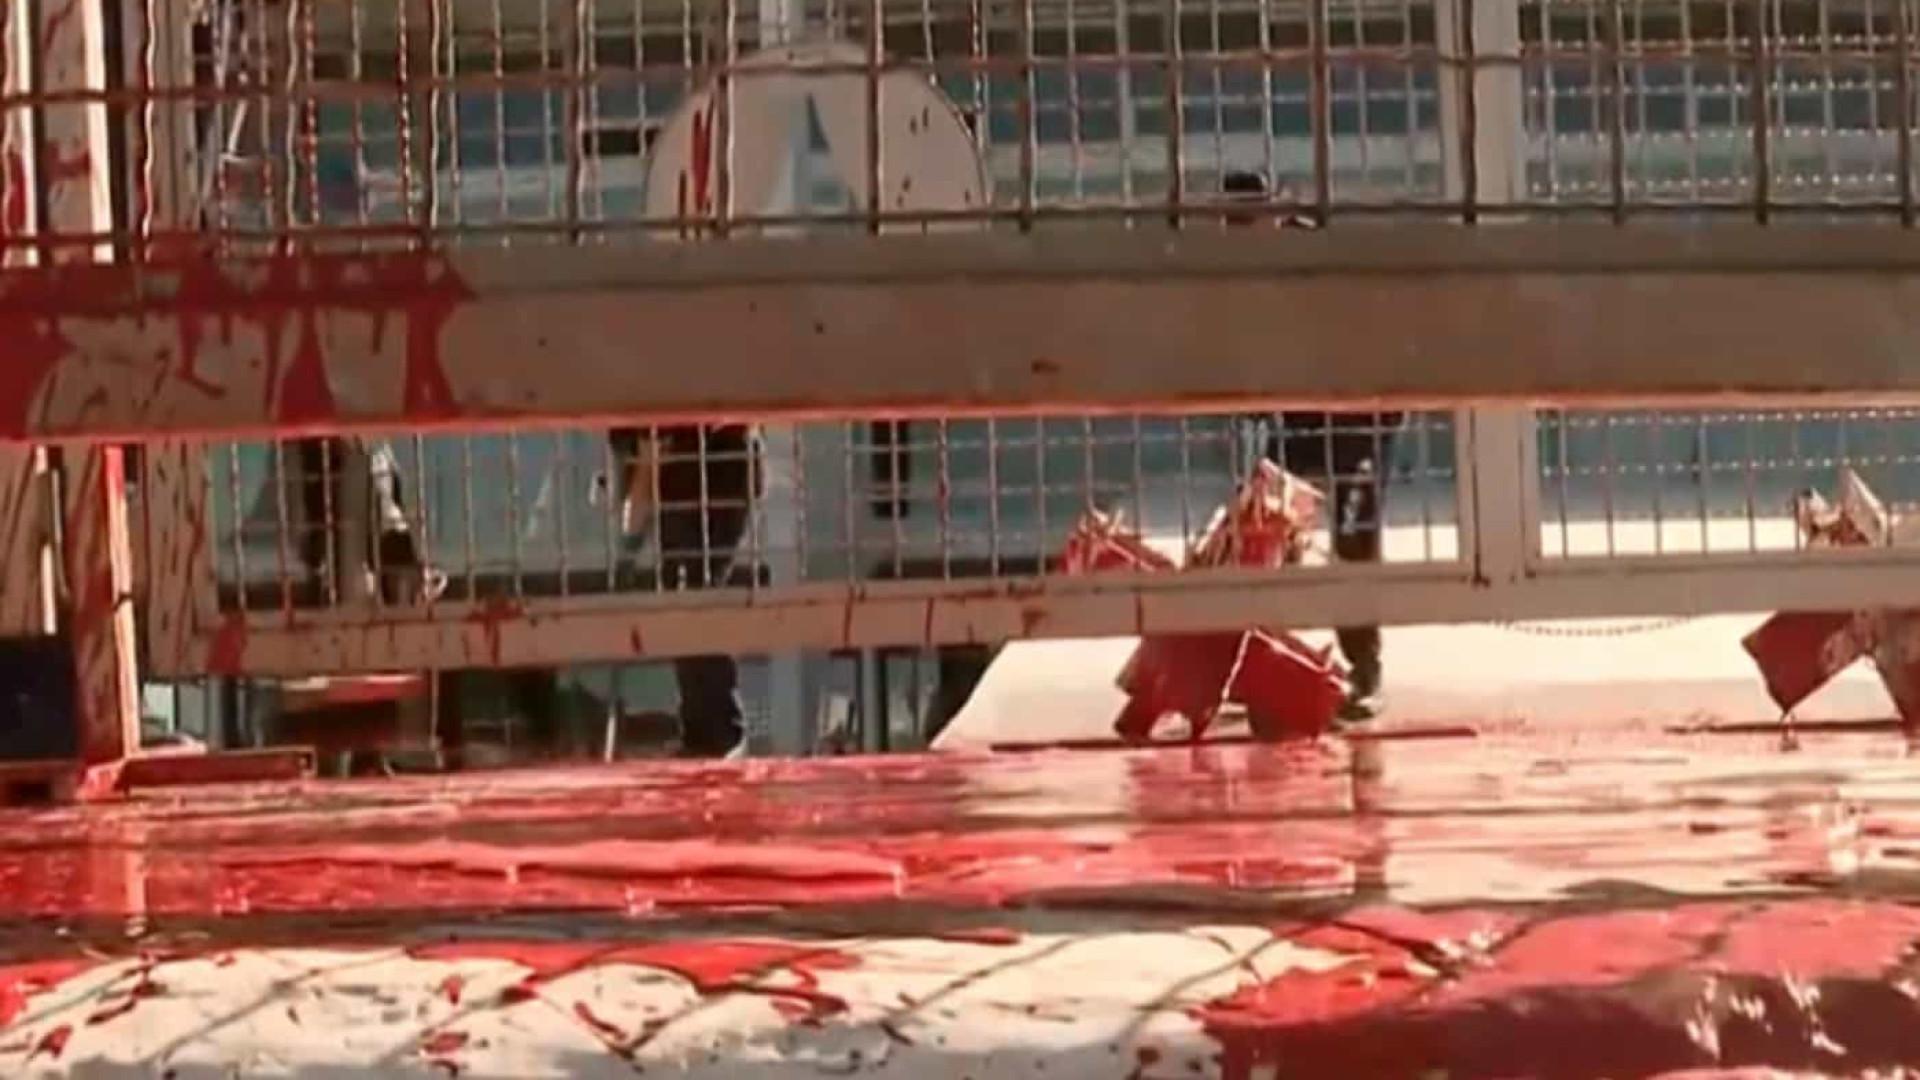 Homem é detido após jogar tinta na rampa do Palácio do Planalto